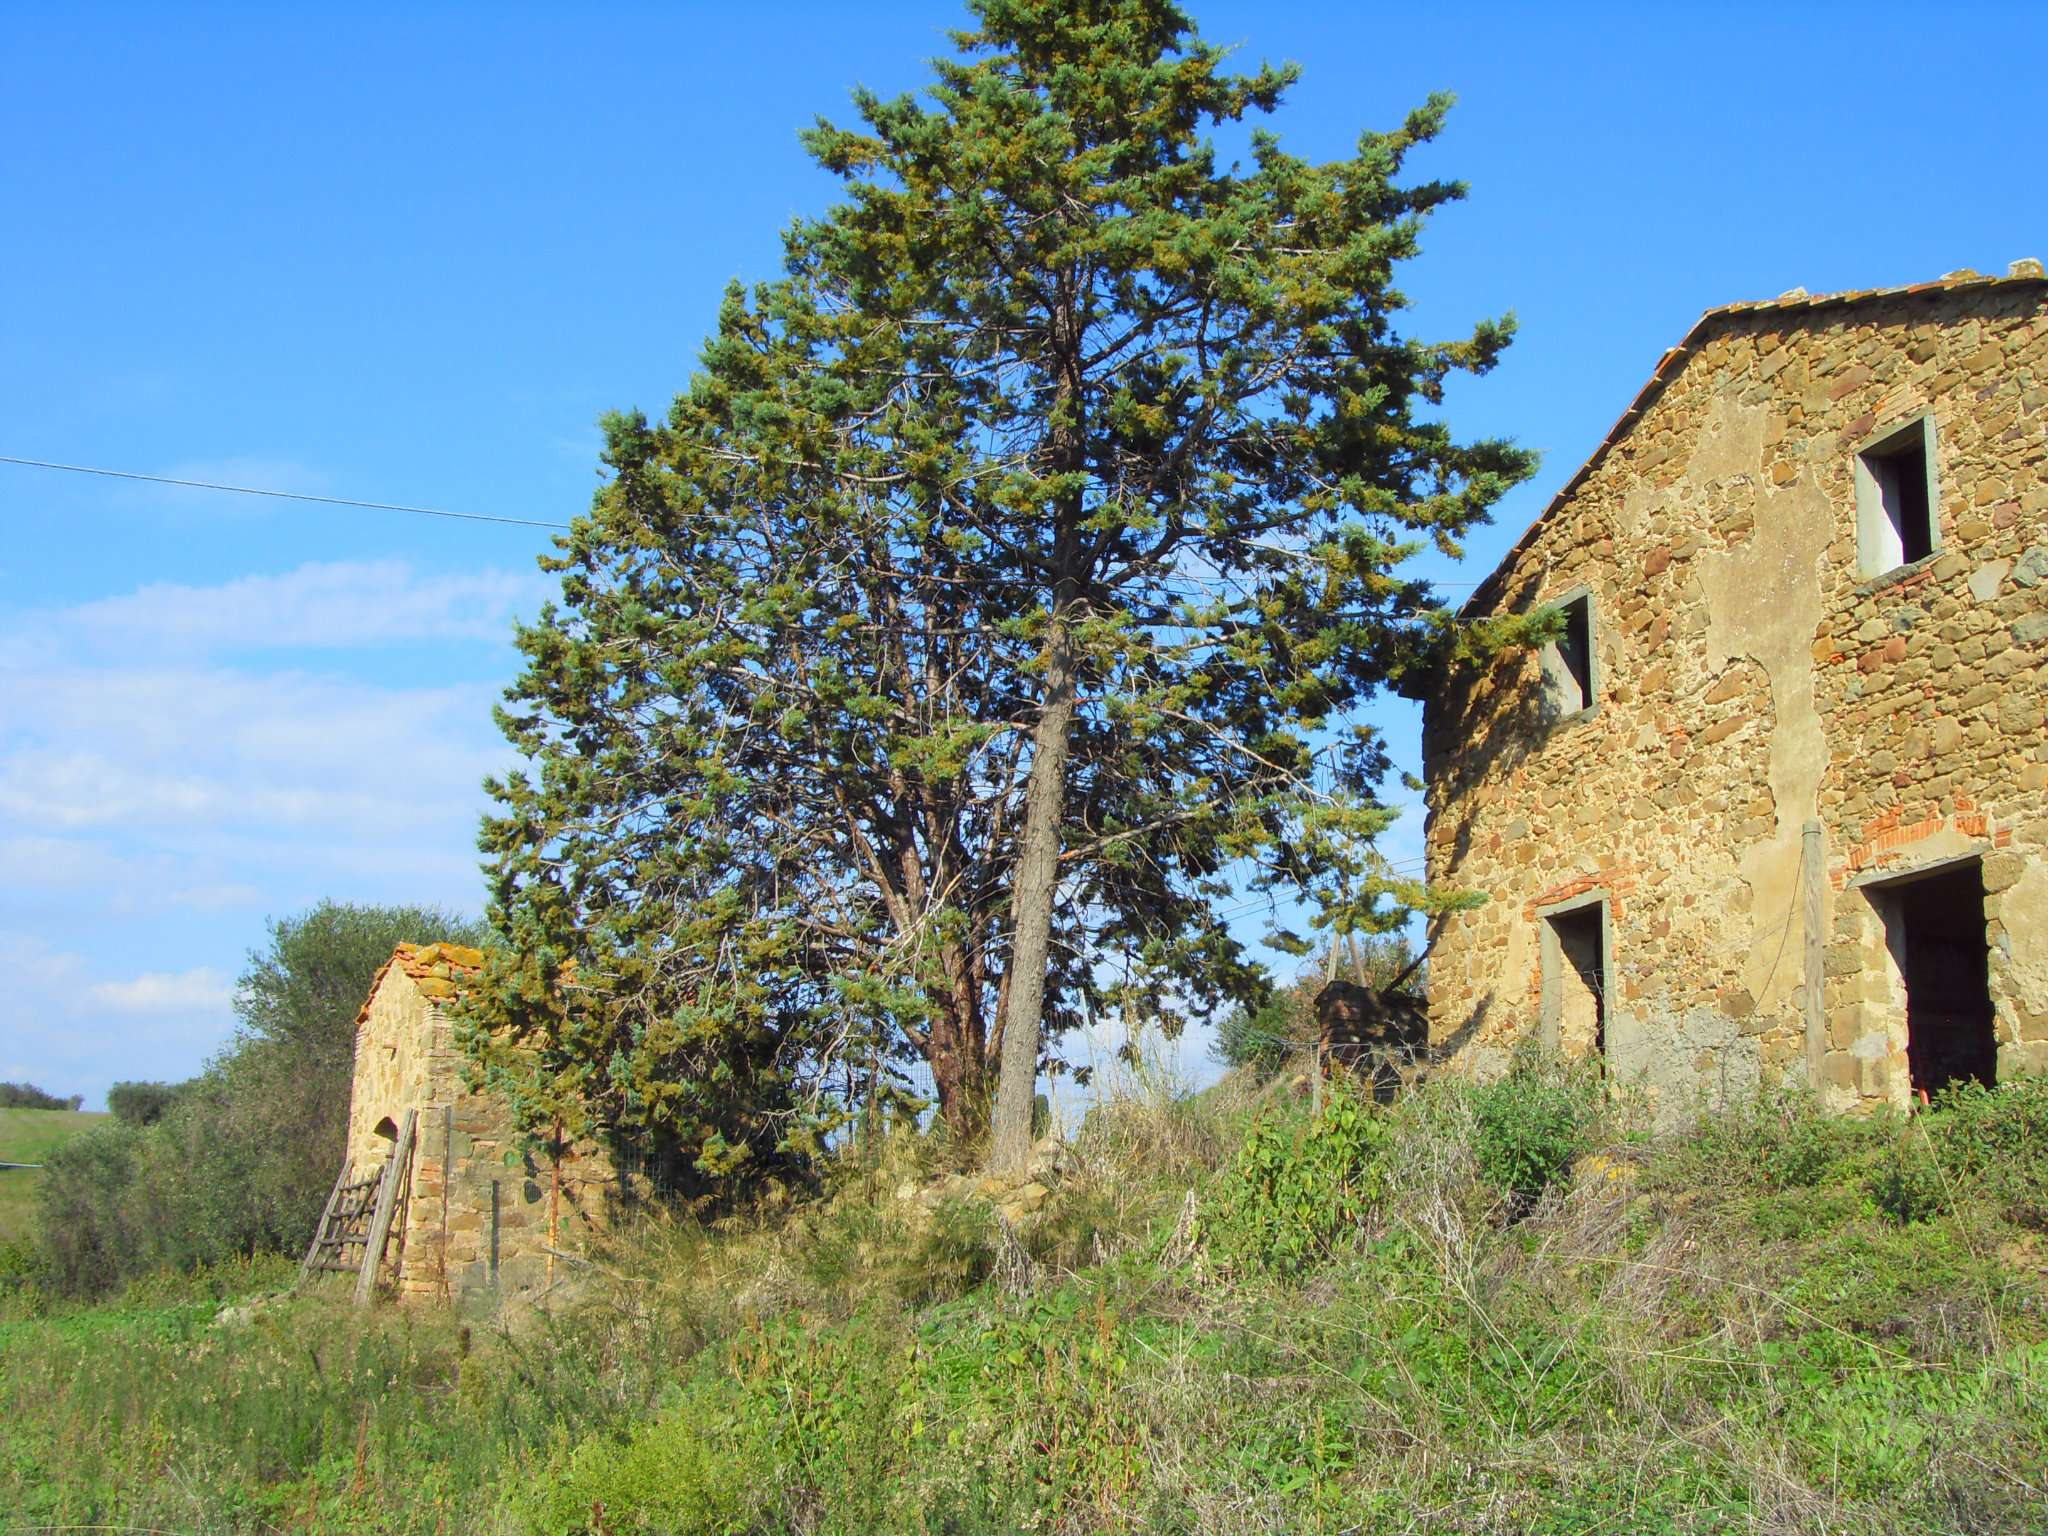 Casa rurale a Montiano